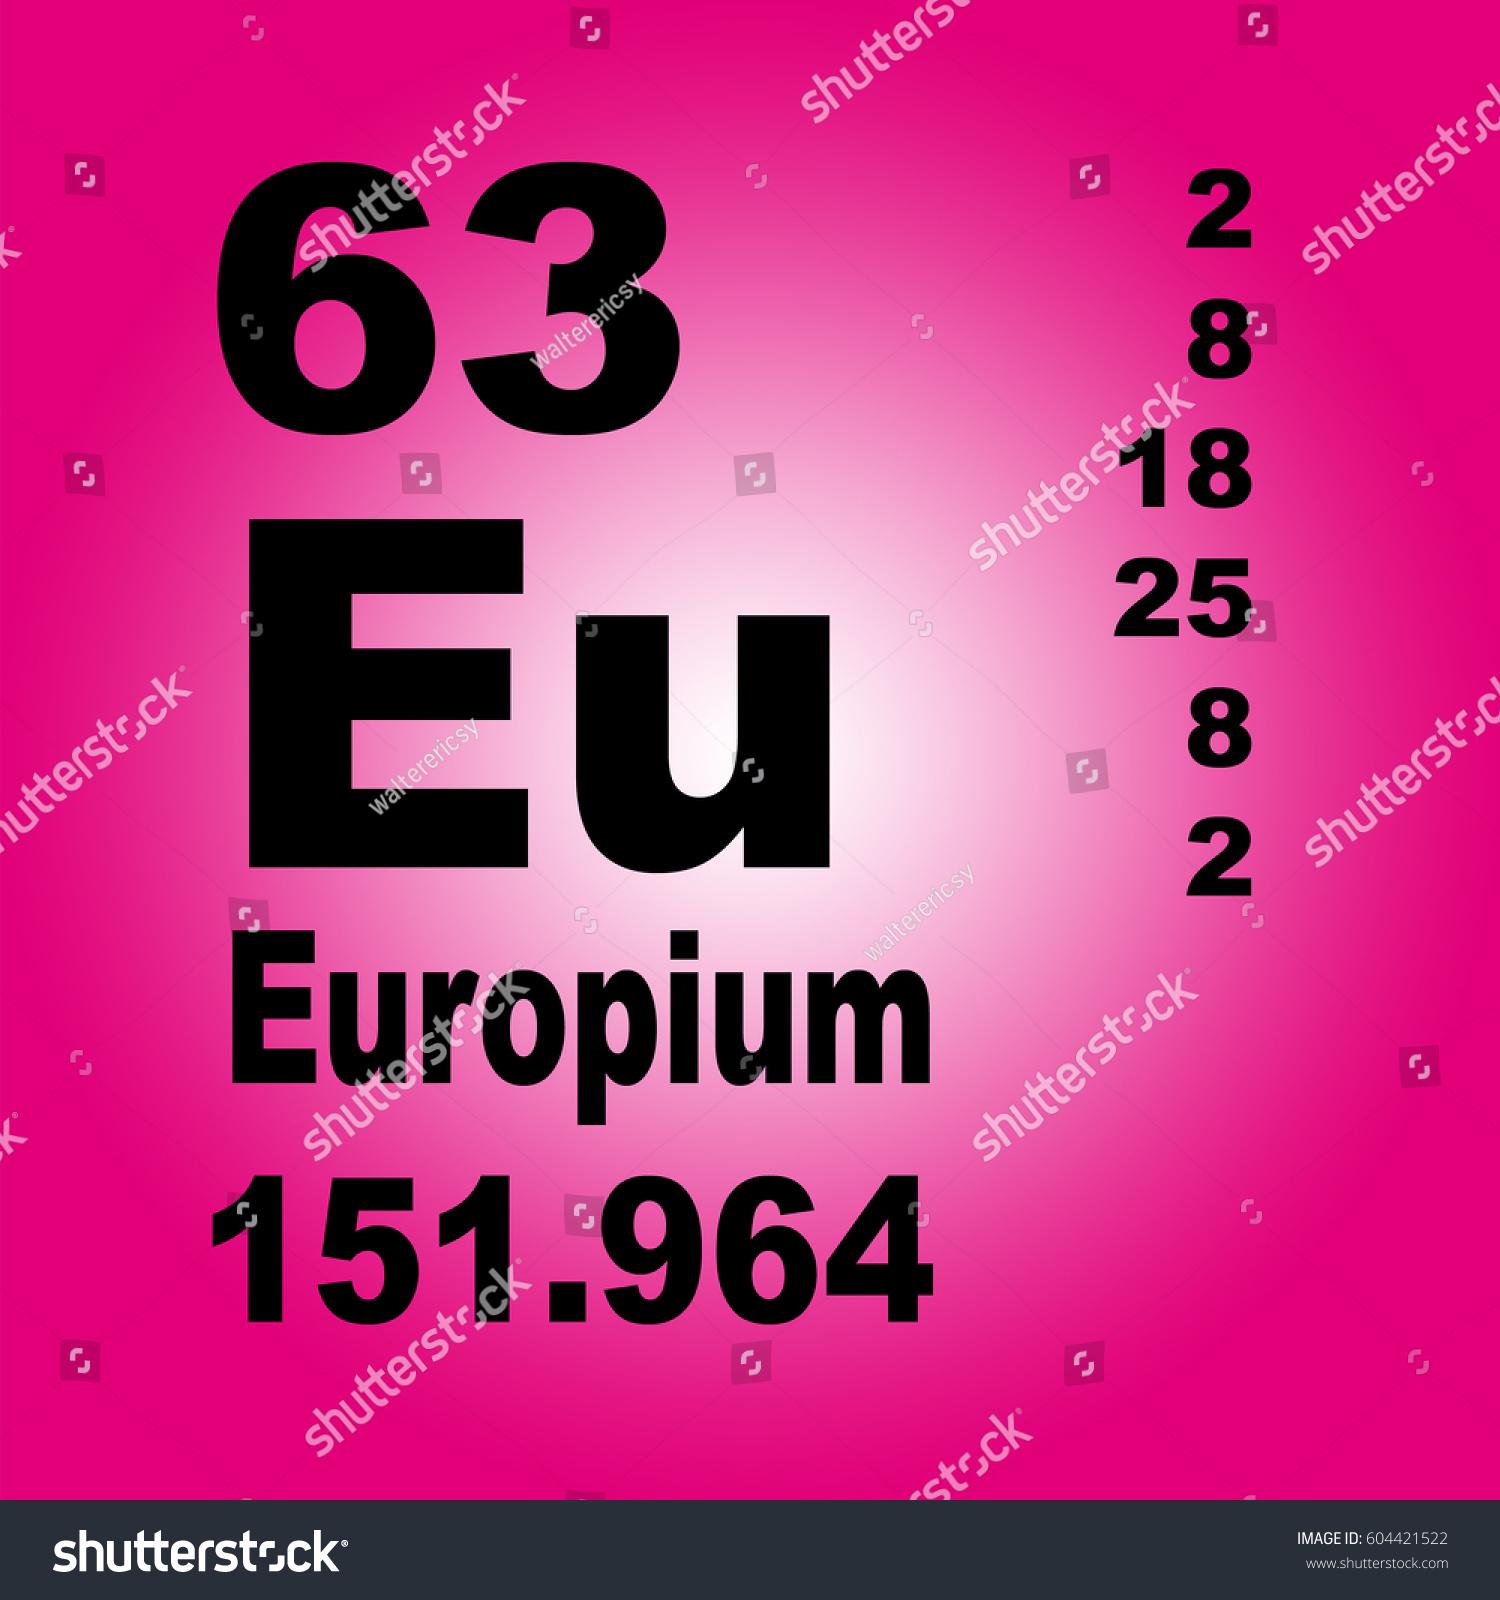 Europium periodic table elements stock illustration 604421522 europium periodic table elements stock illustration 604421522 shutterstock urtaz Choice Image